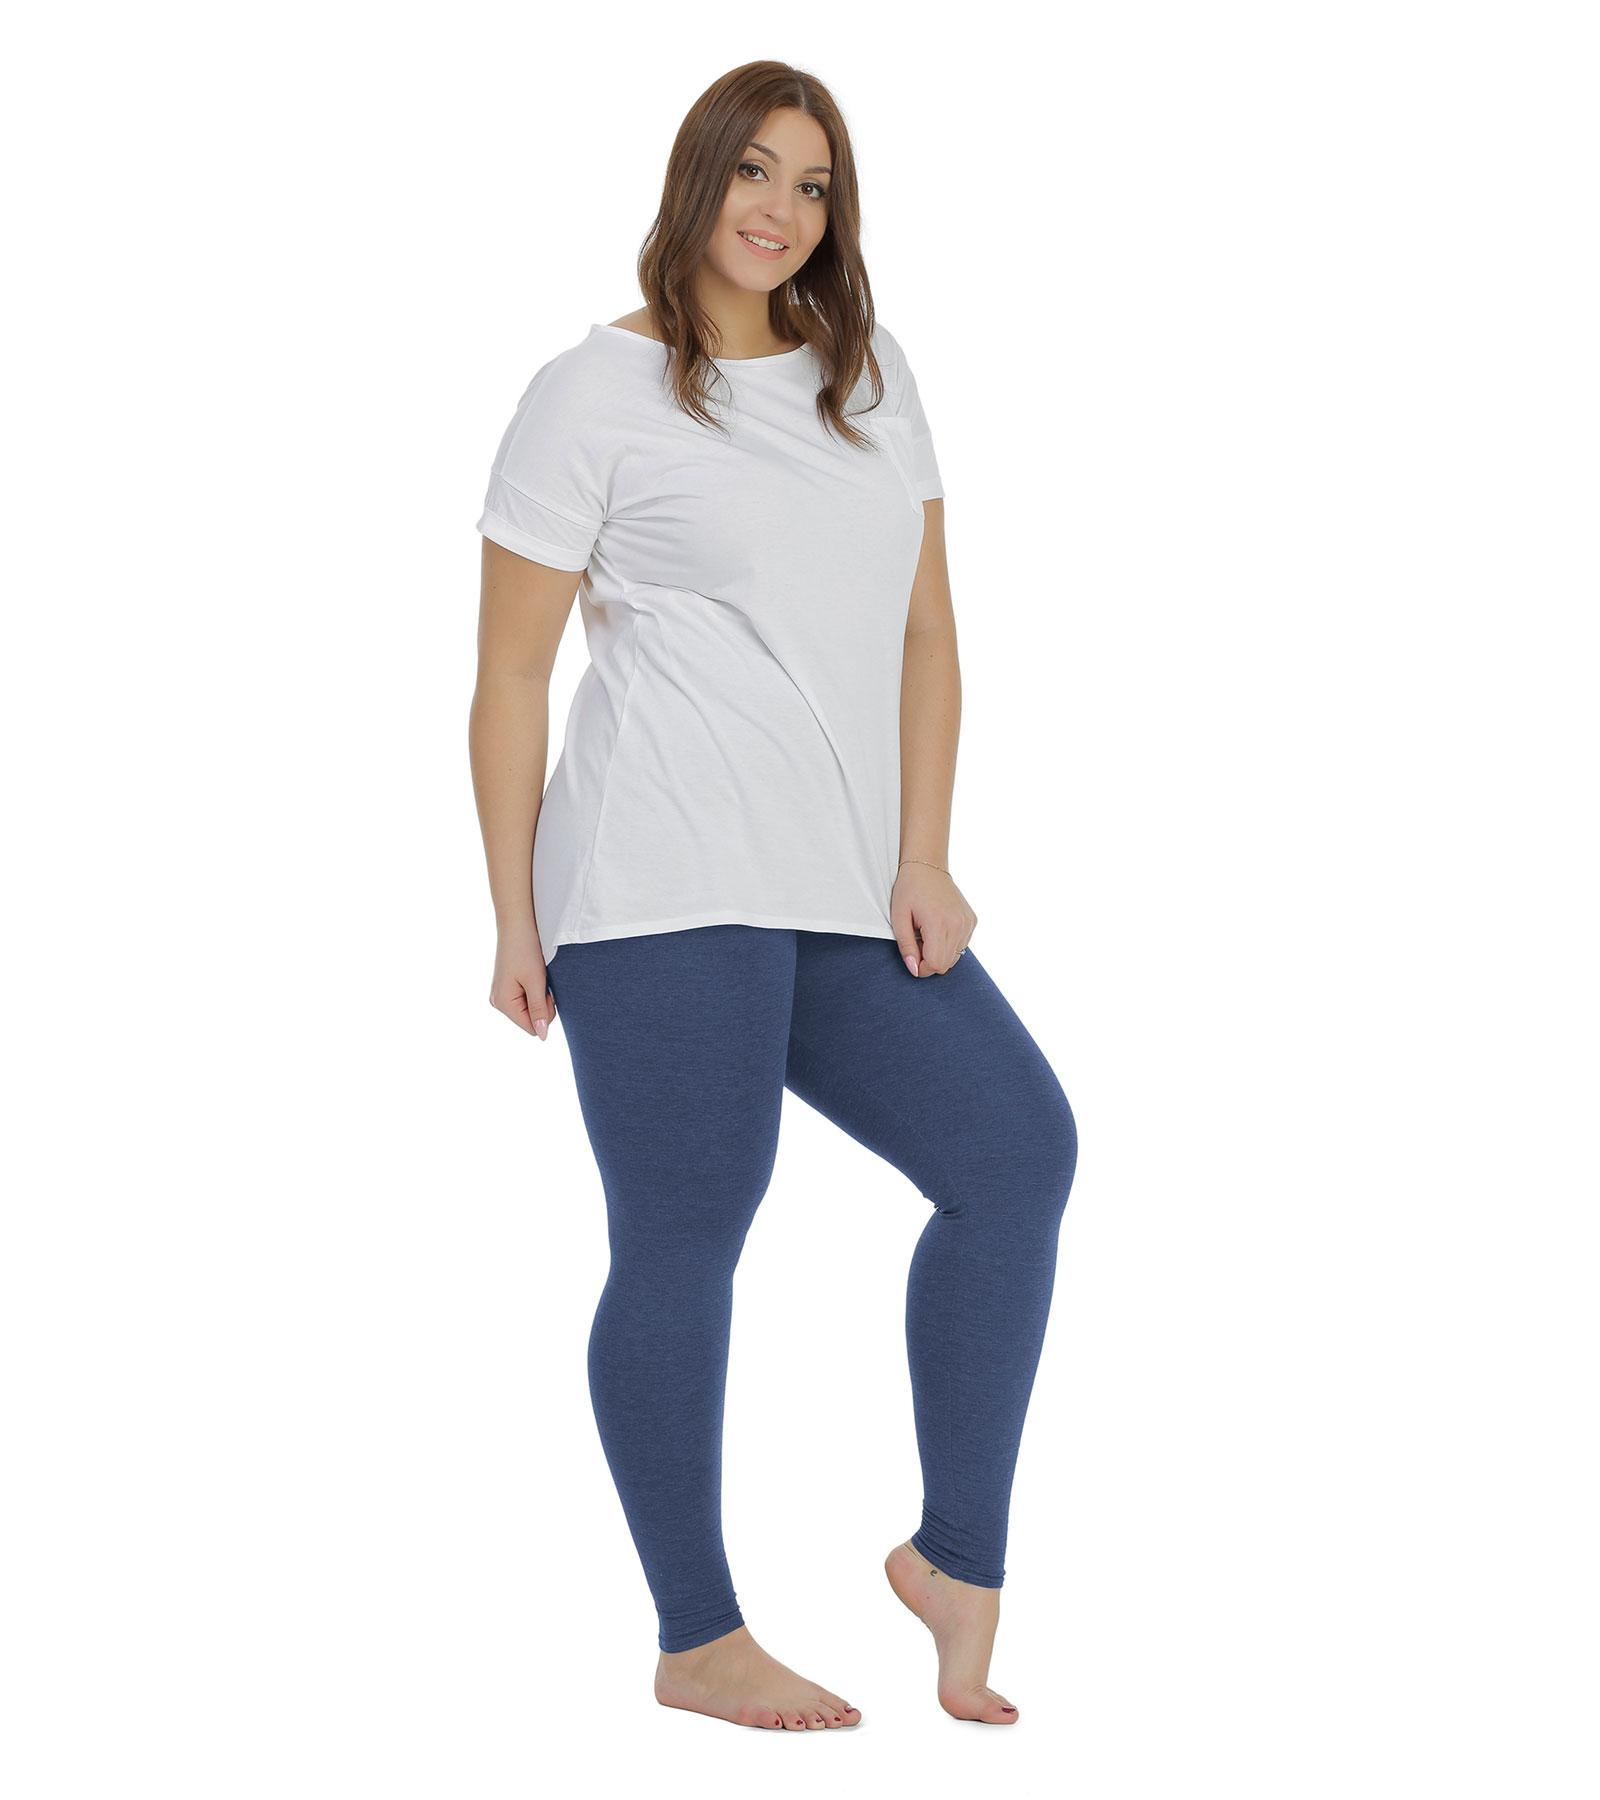 Legginsy damskie Bensini® w kolorze jeansu